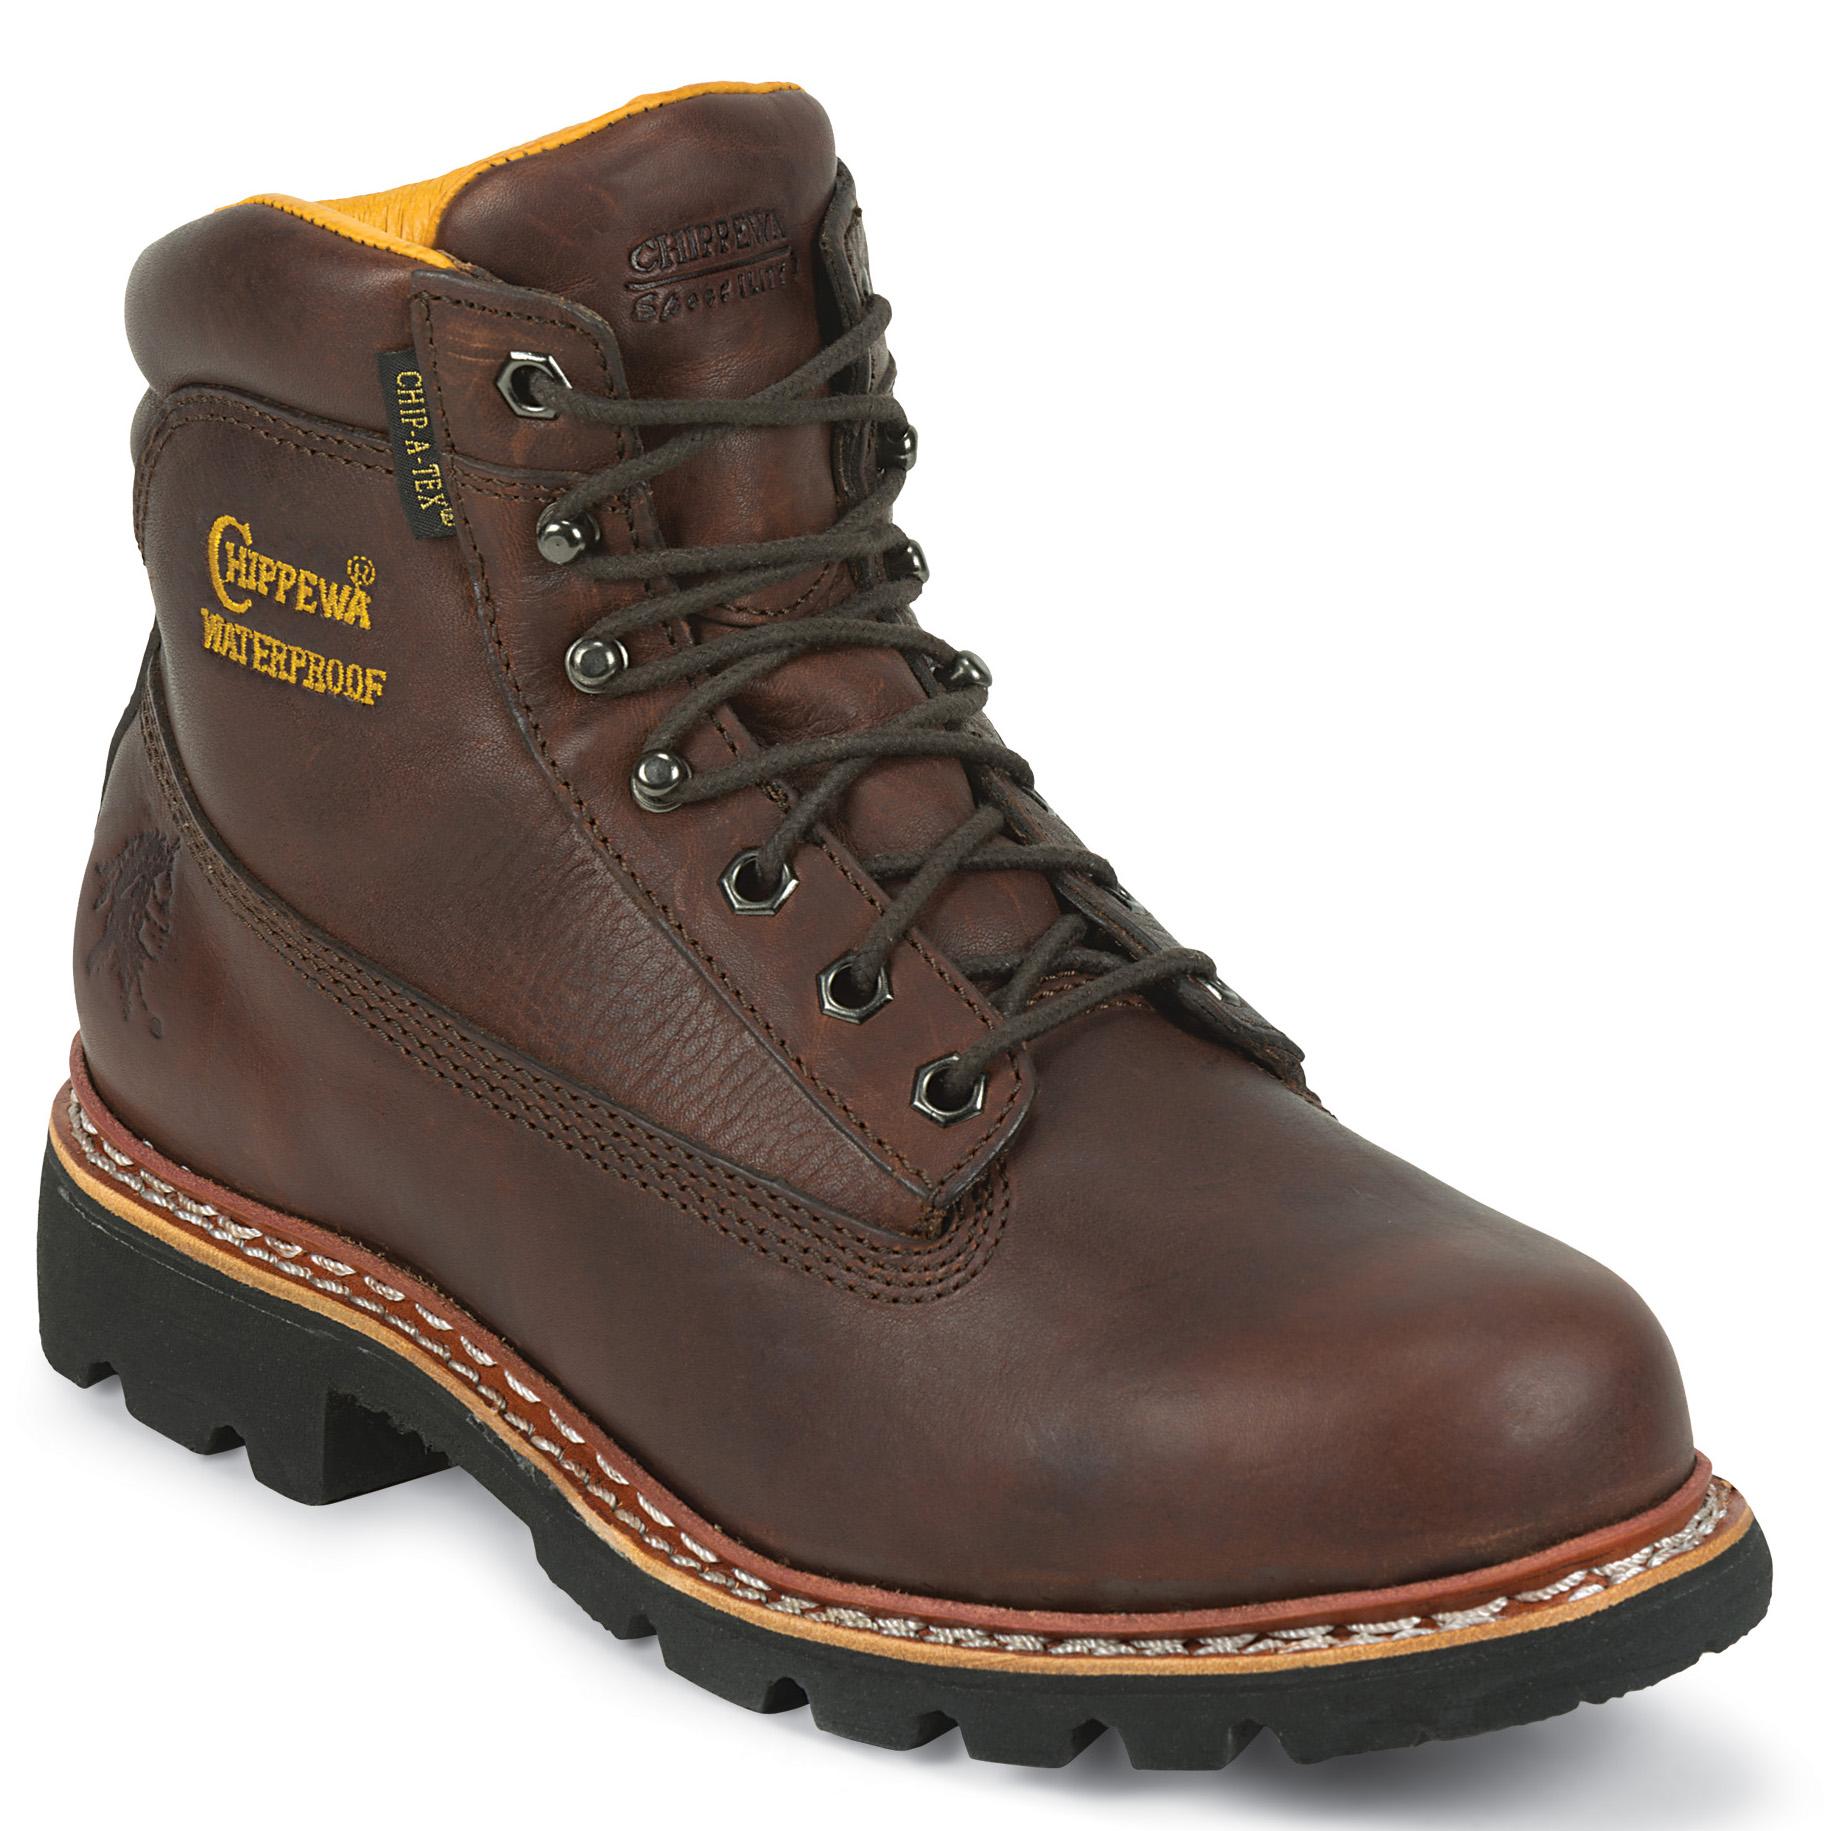 Chippewa Chippewa Mens 6-Inch Norwegian Welt Boot Waterproof Rated Brown 25945